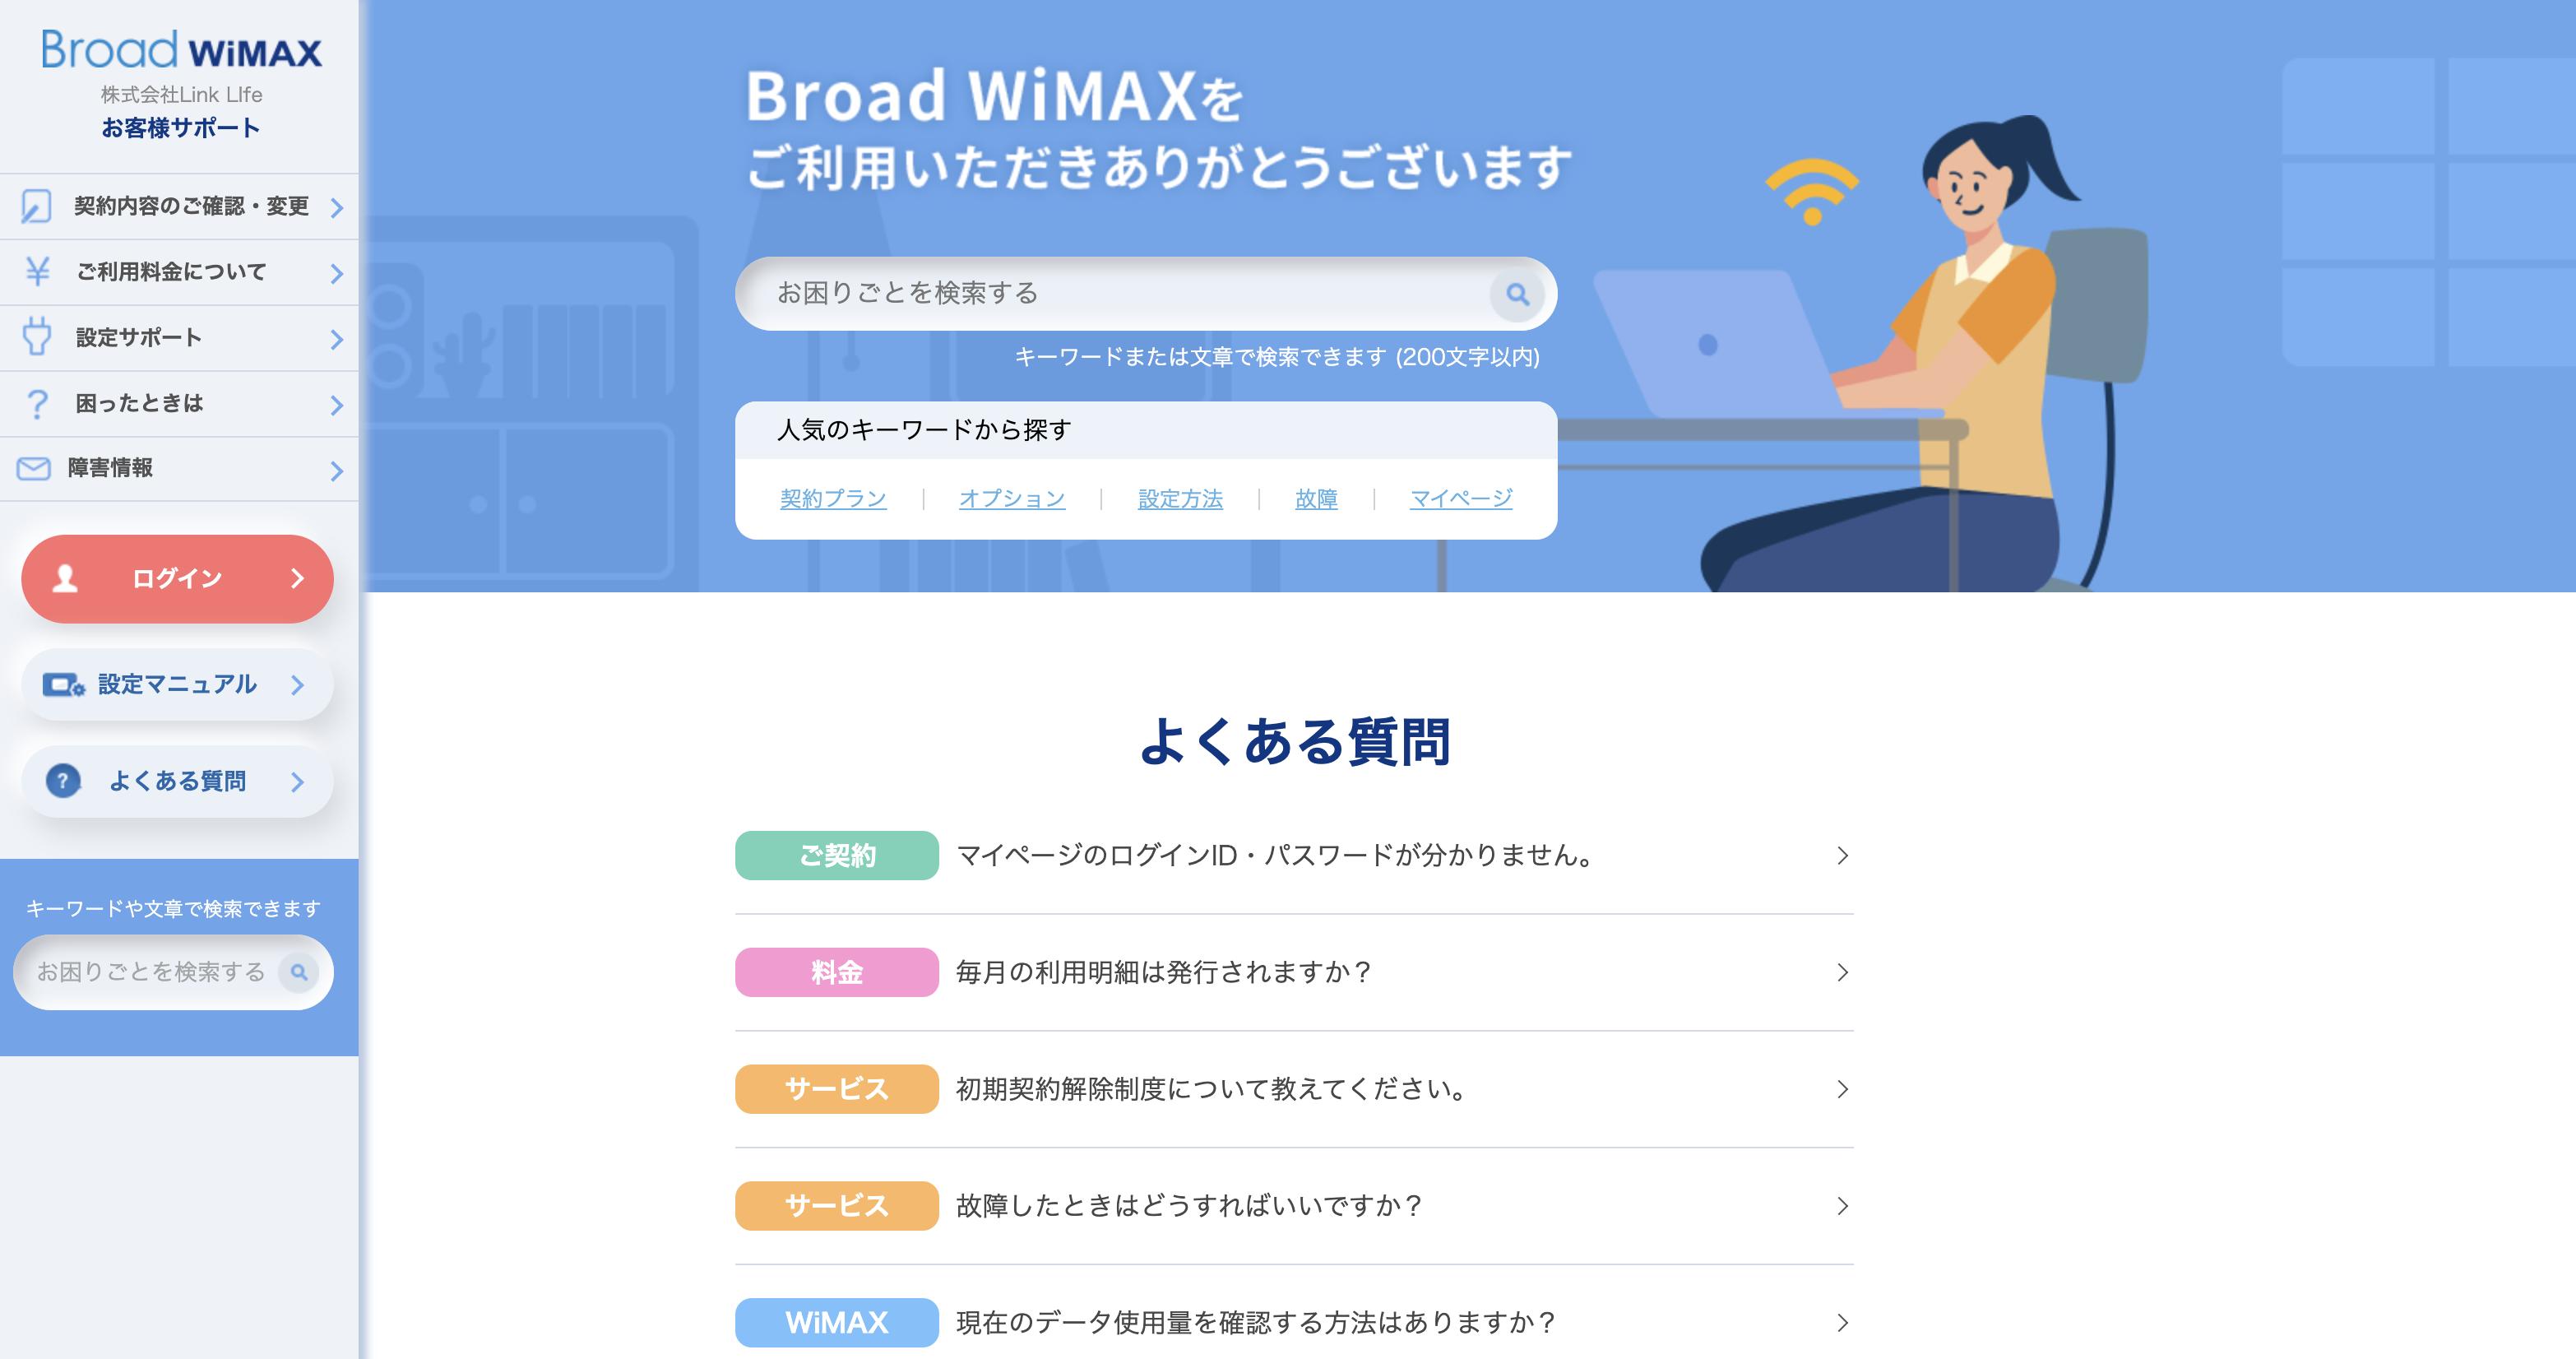 Broad WiMAX(ブロードワイマックス)のよくある質問ページ